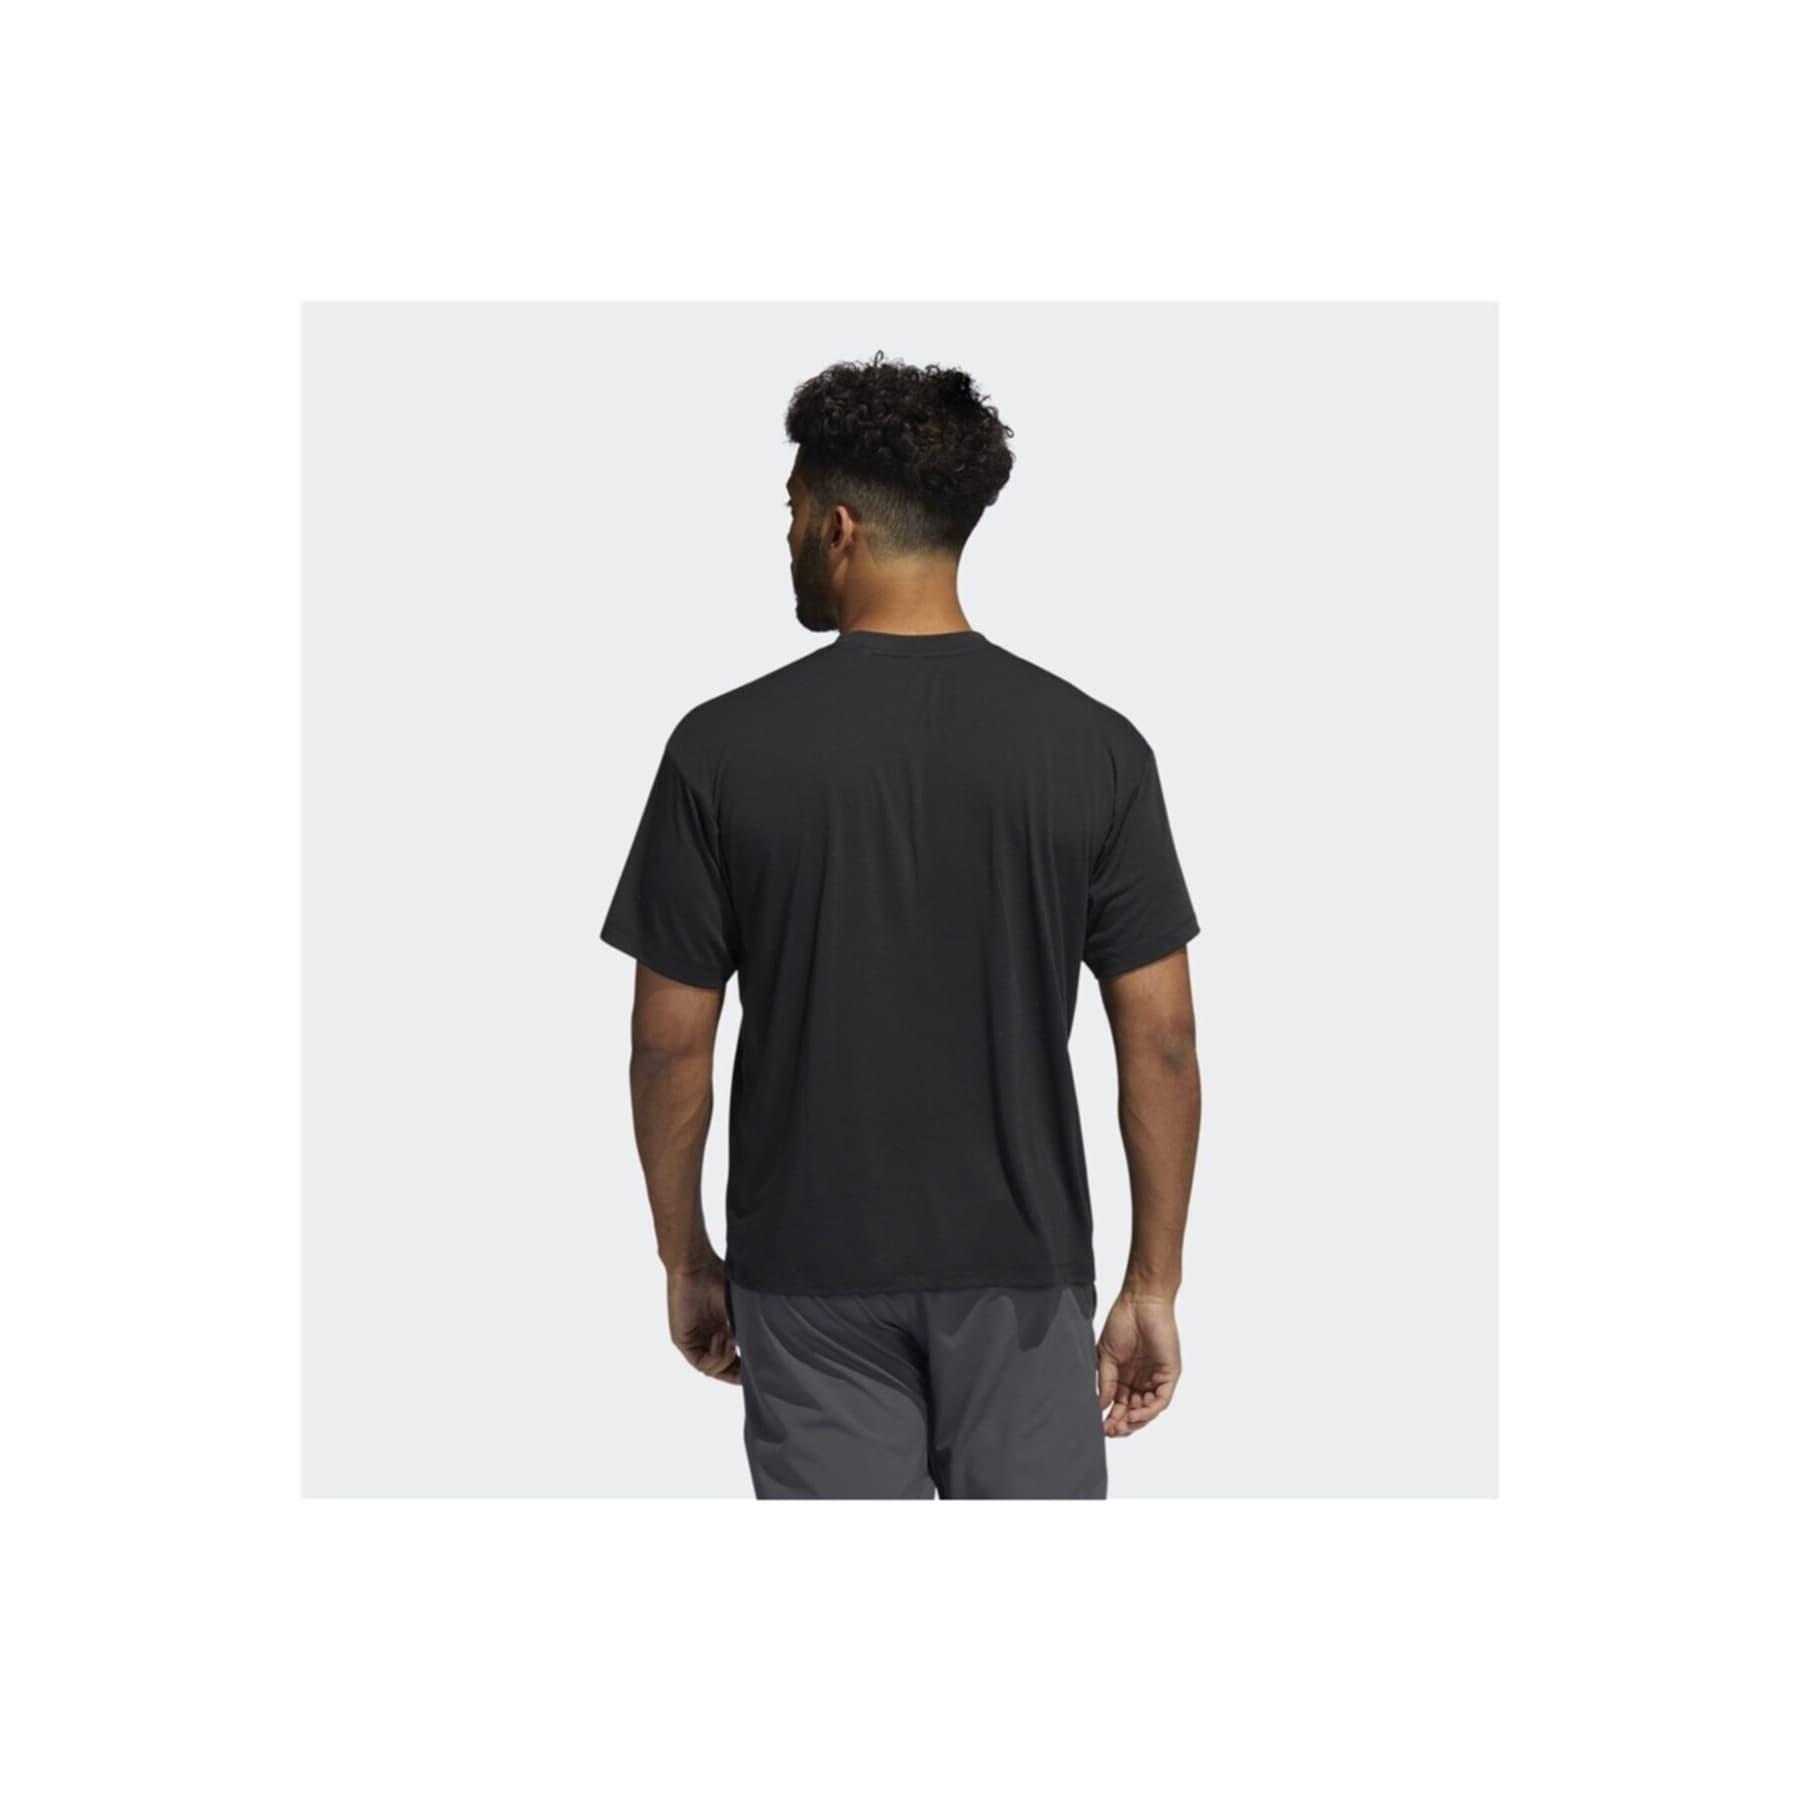 Egle Graphic Unite Erkek Siyah Tişört (GN9144)